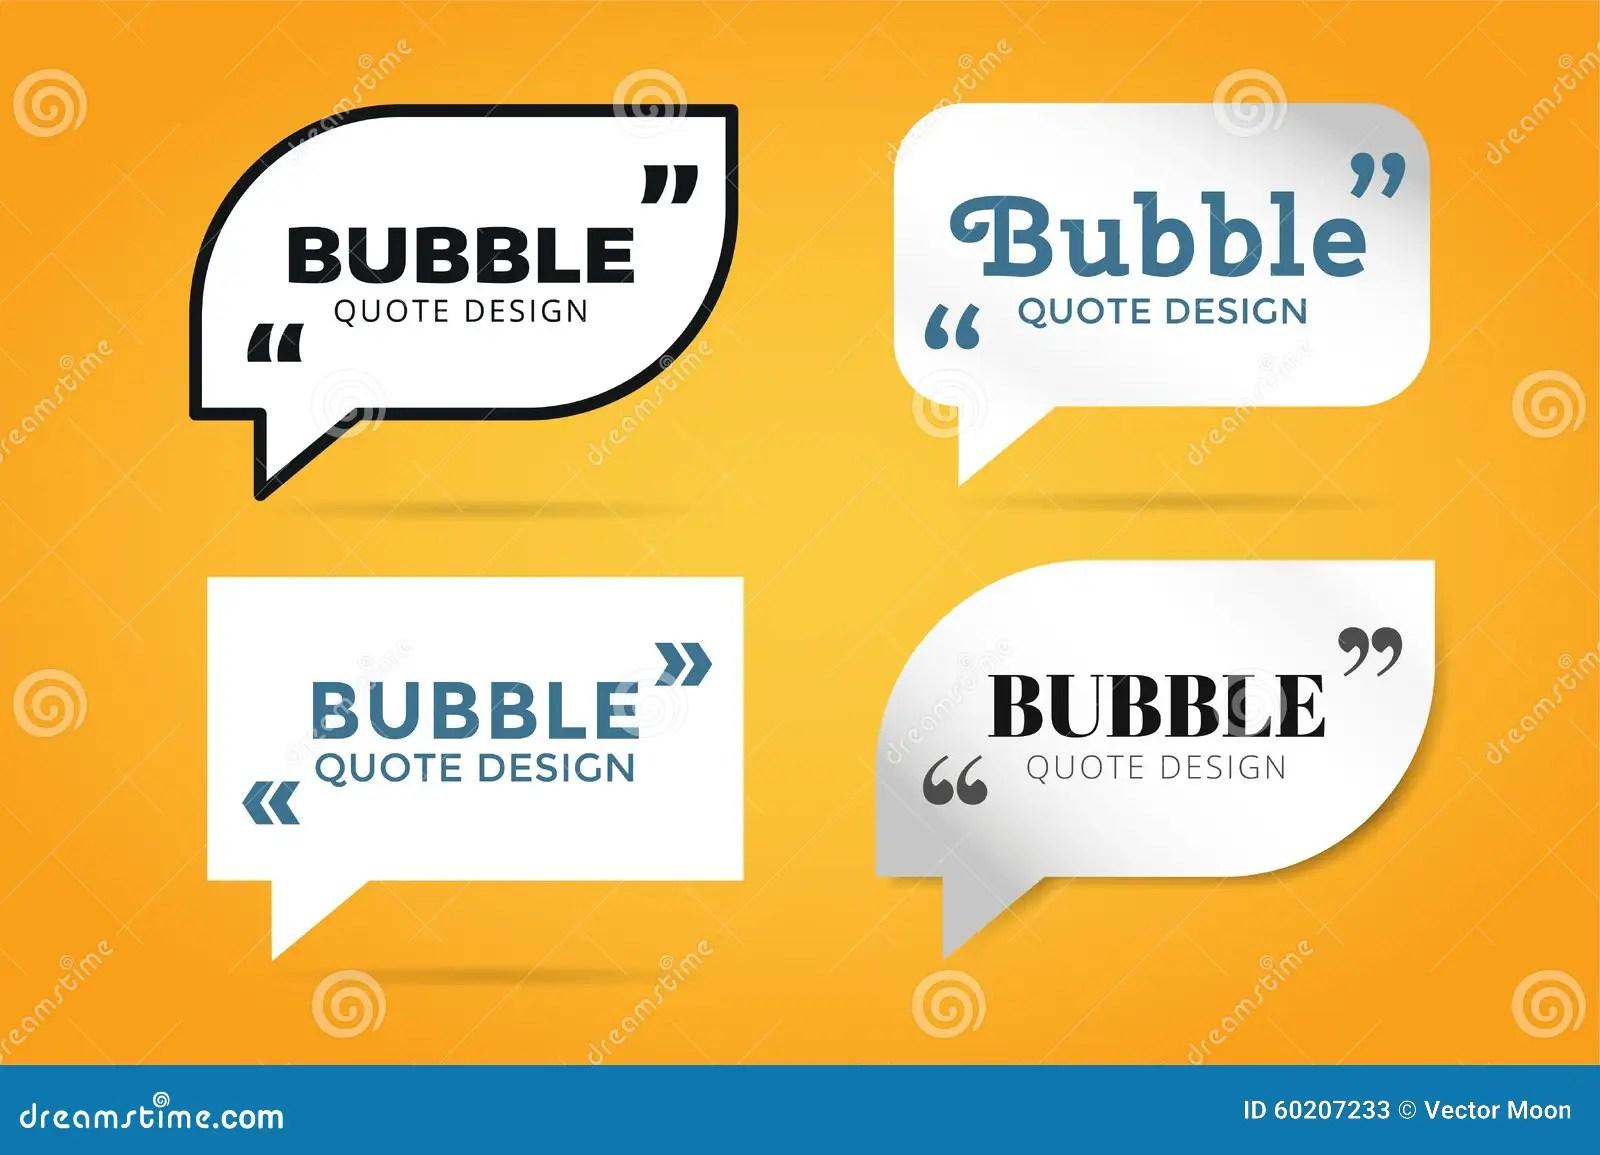 Download Quote Blank Template Bubble Empty Design Stock Vector -  Illustration Of Memo, Design: